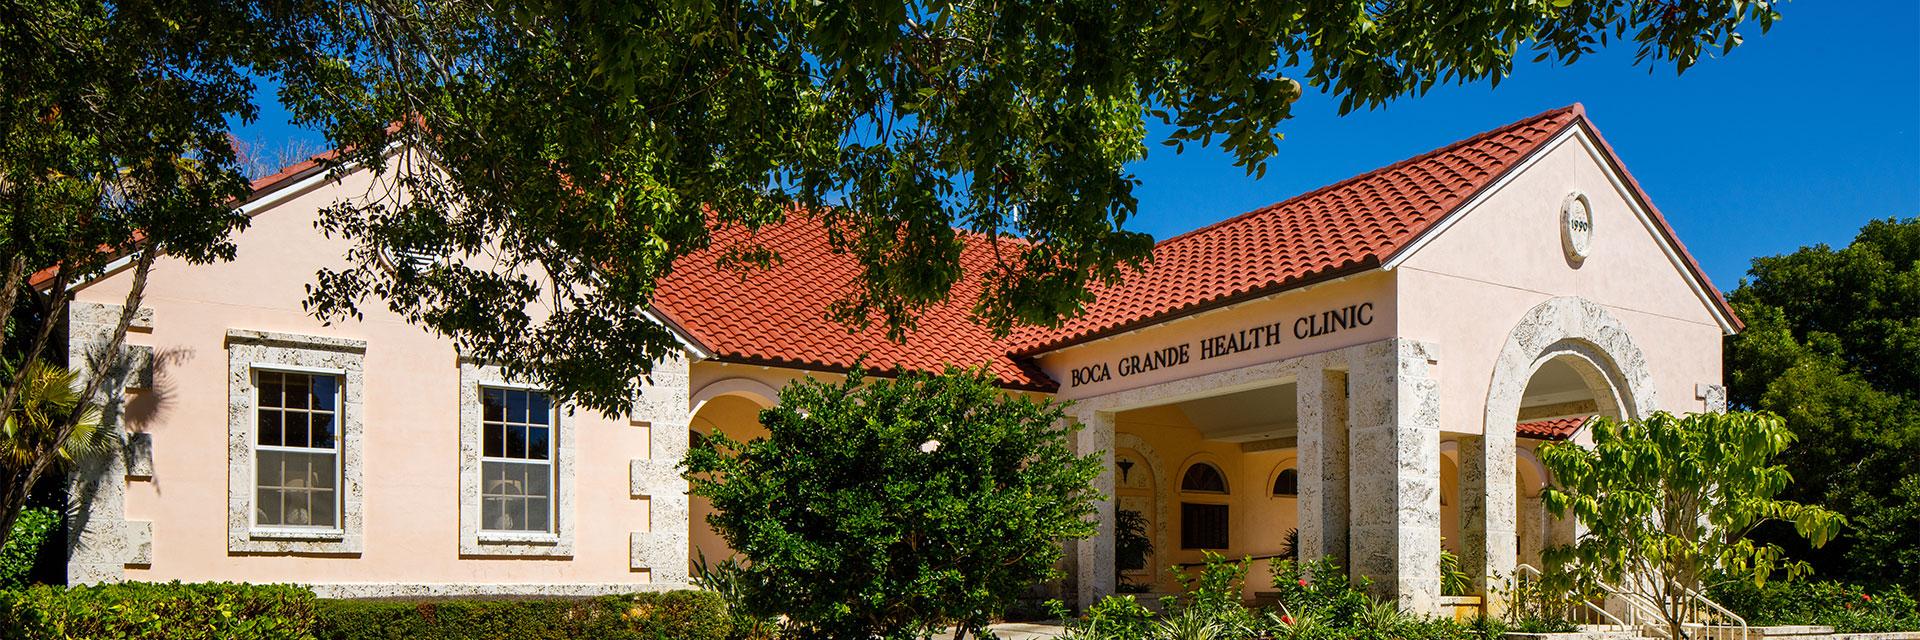 Boca Grande Health Clinic building side view - trees